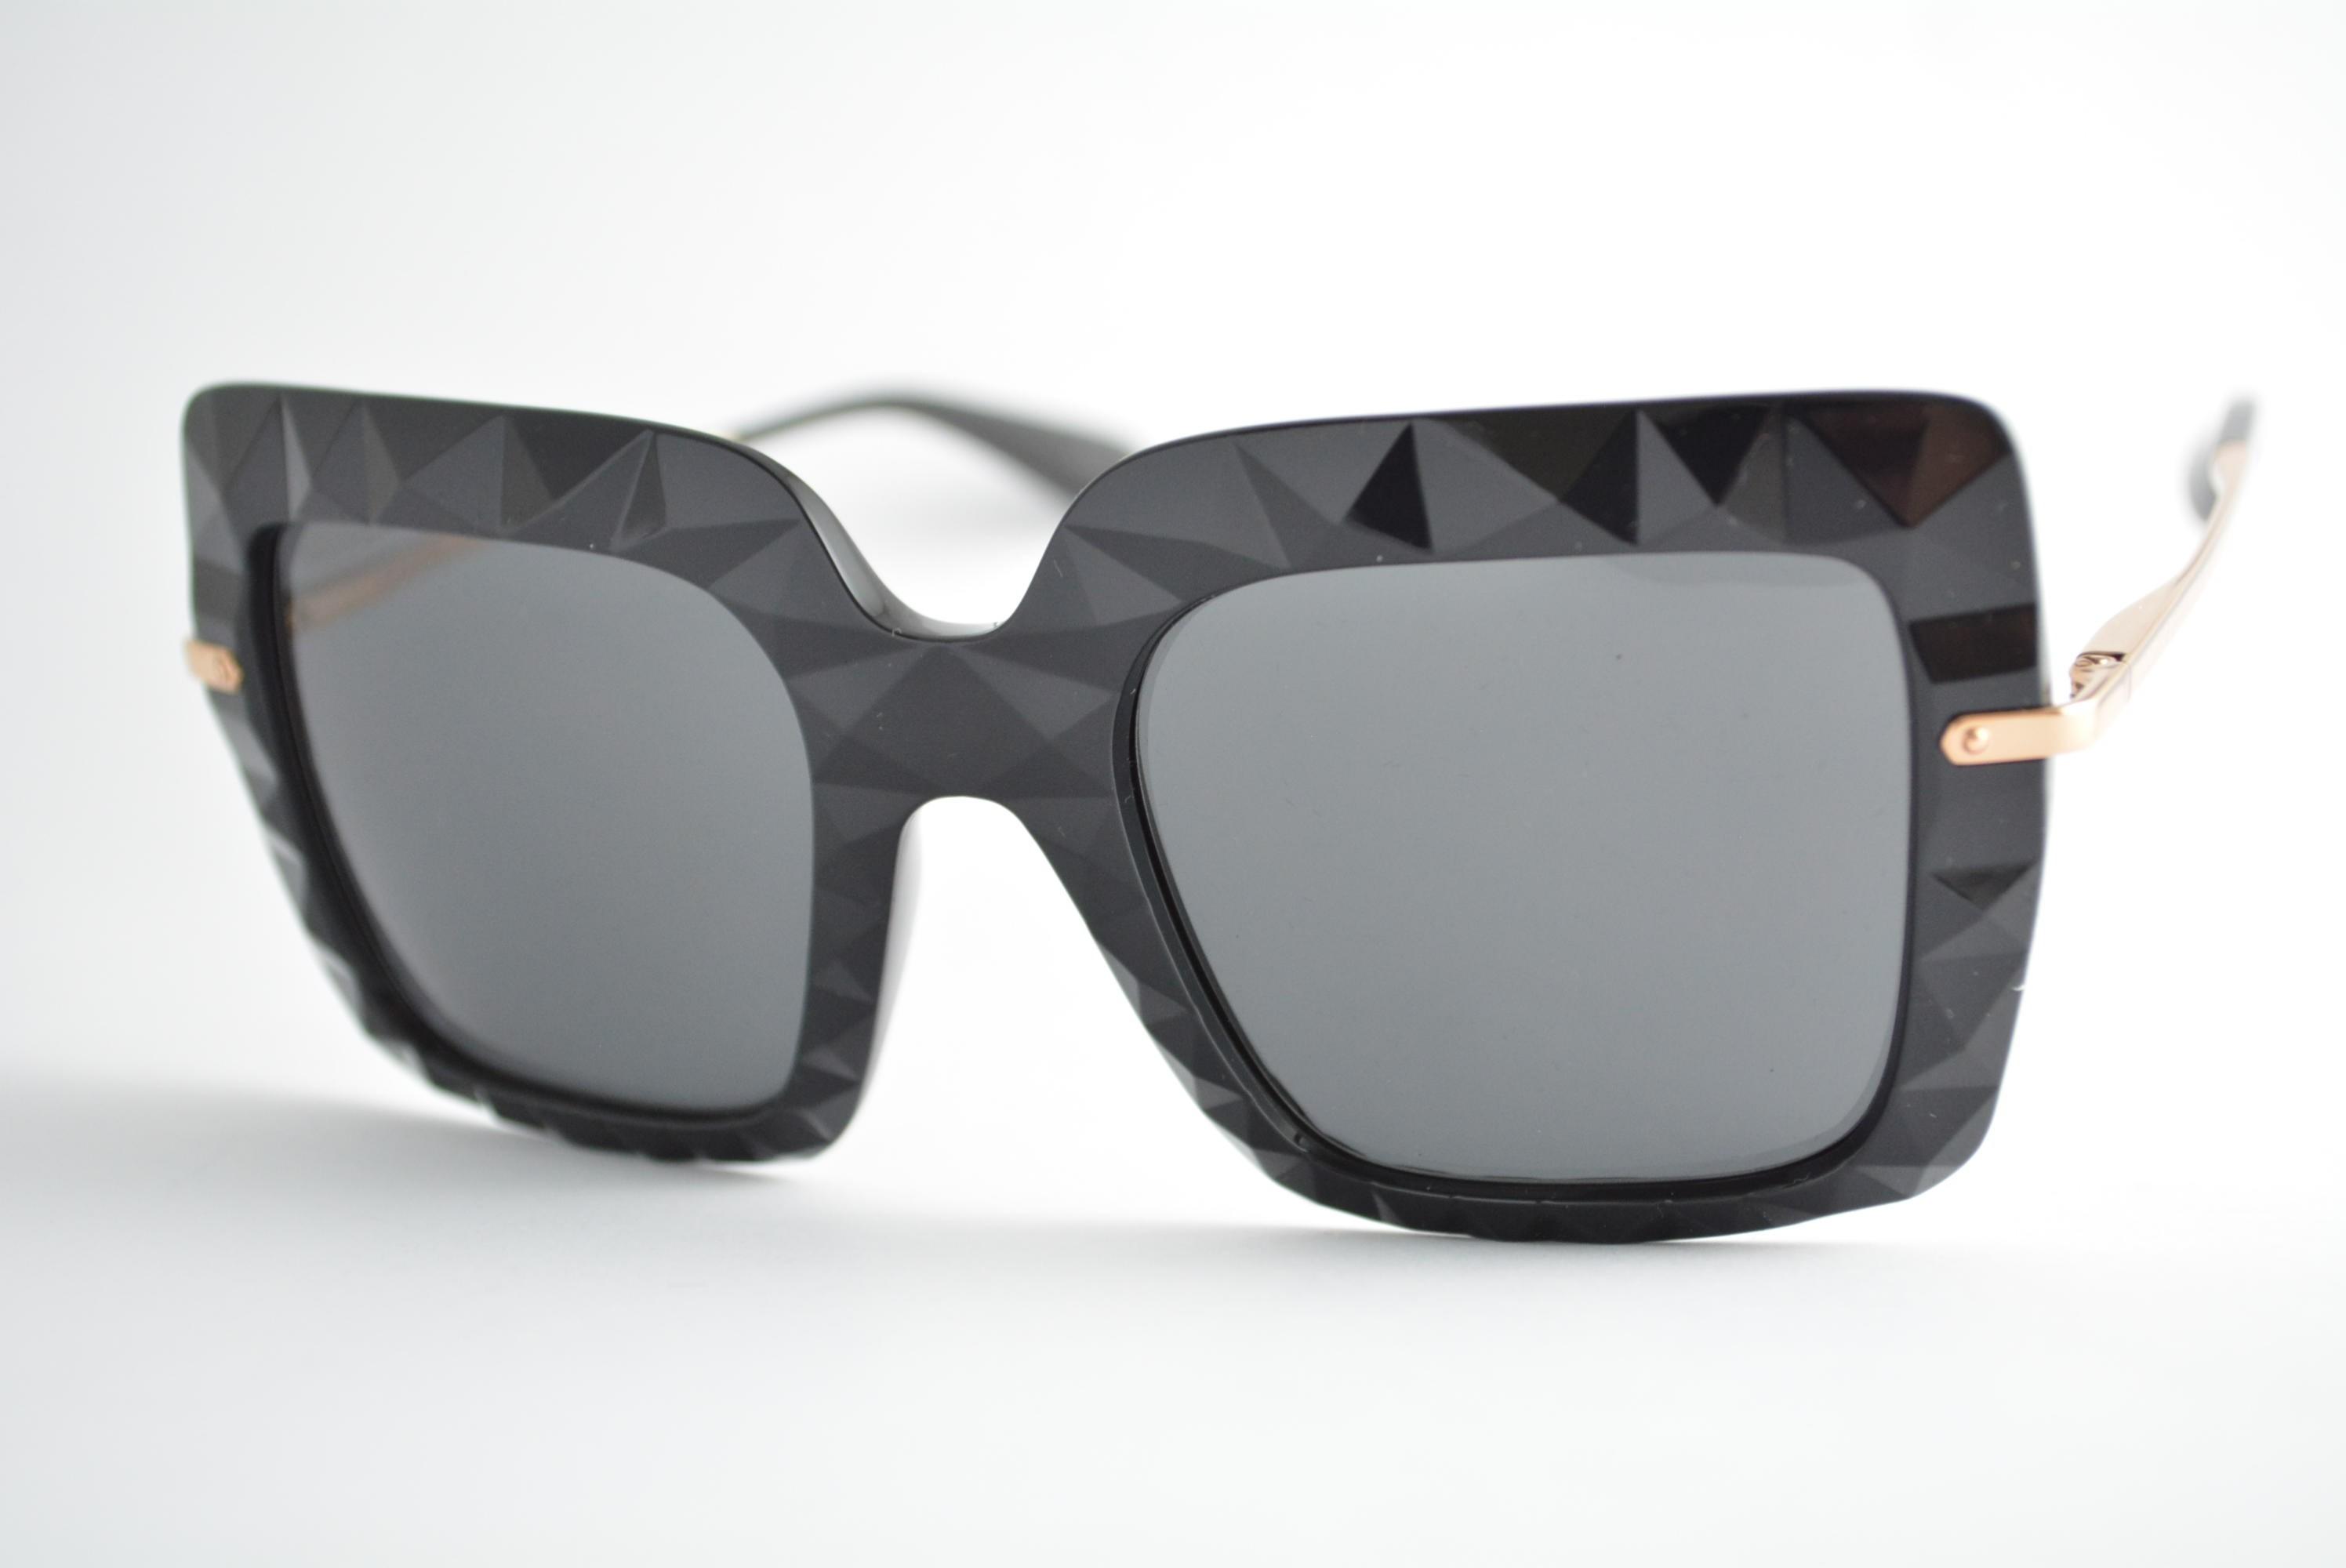 óculos de sol Dolce   Gabbana mod DG6111 501 87 Ótica Cardoso 8def9800e8